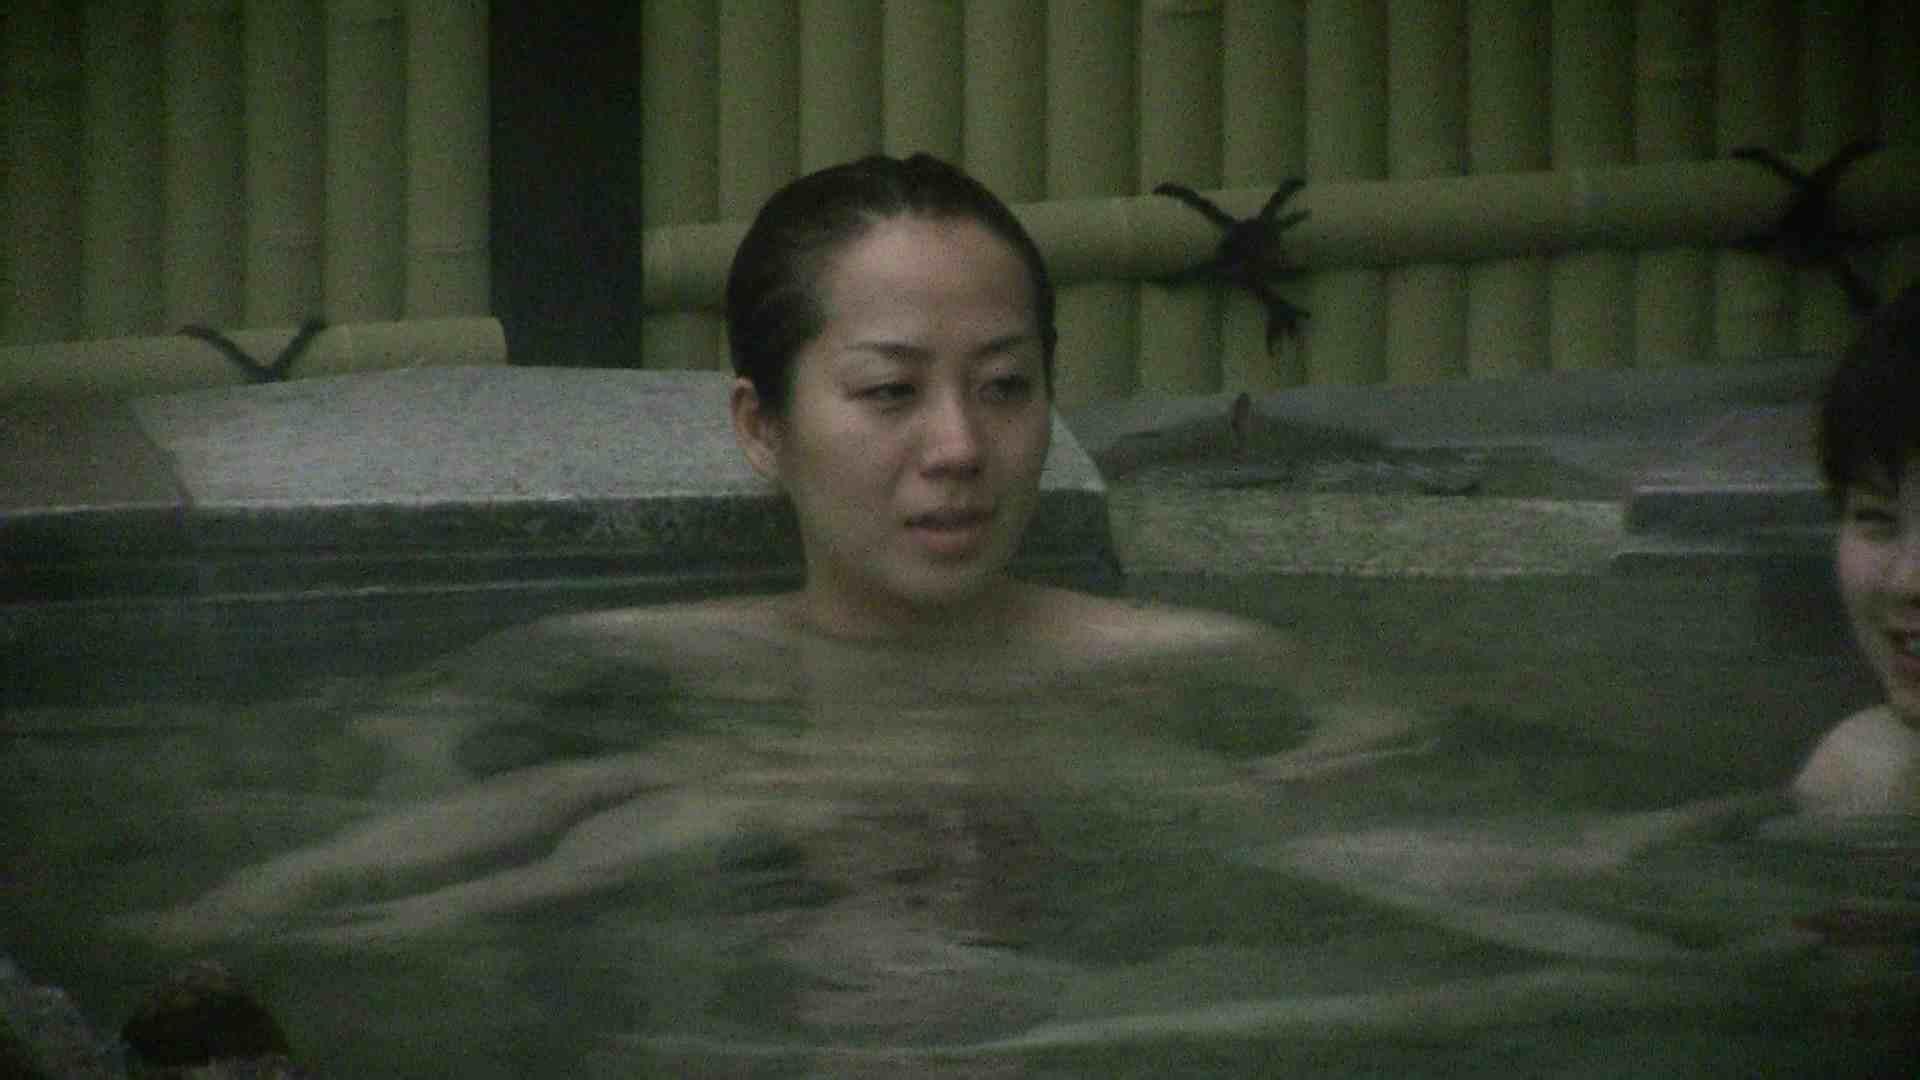 Aquaな露天風呂Vol.539 OL女体  88連発 54